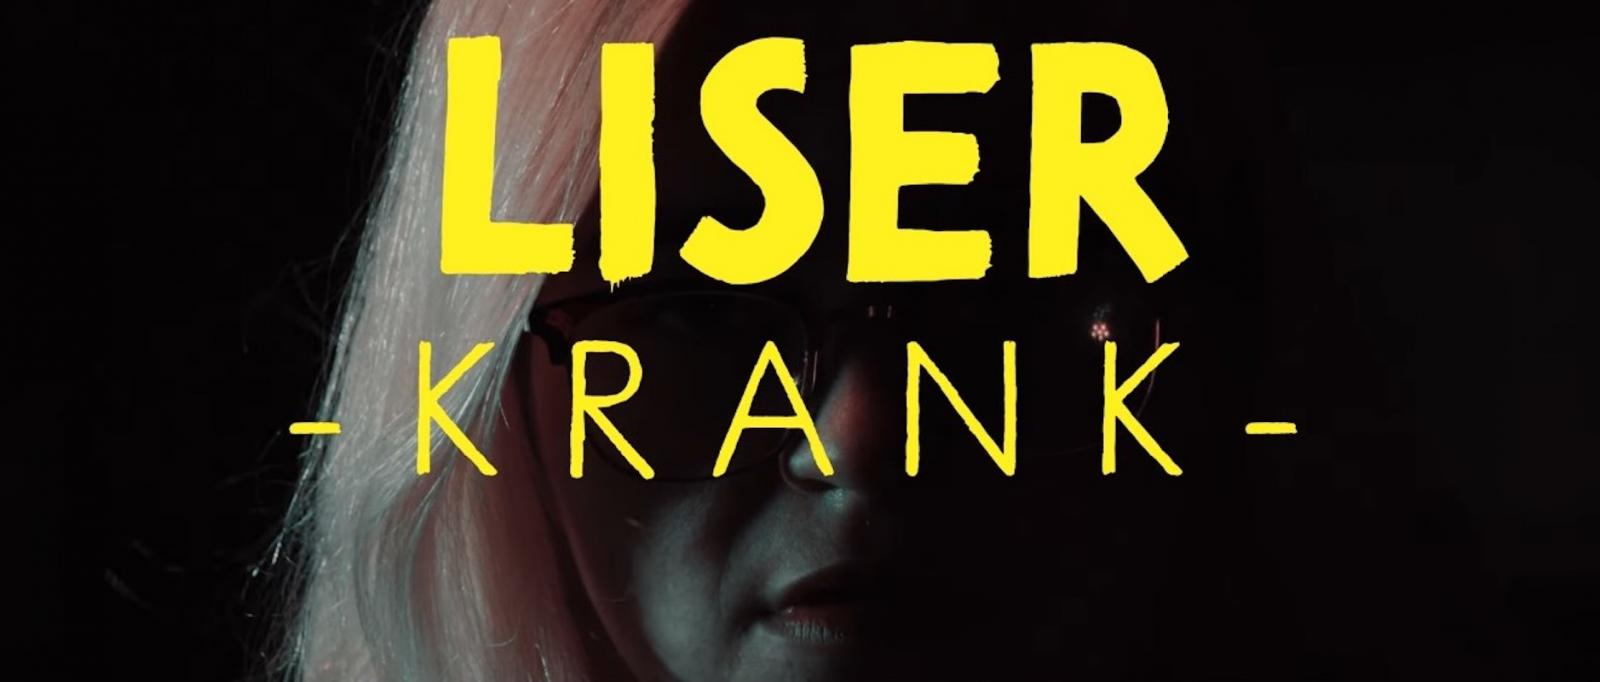 Upcoming: Liser - Krank (prod. Mc Zirkel) [Video]